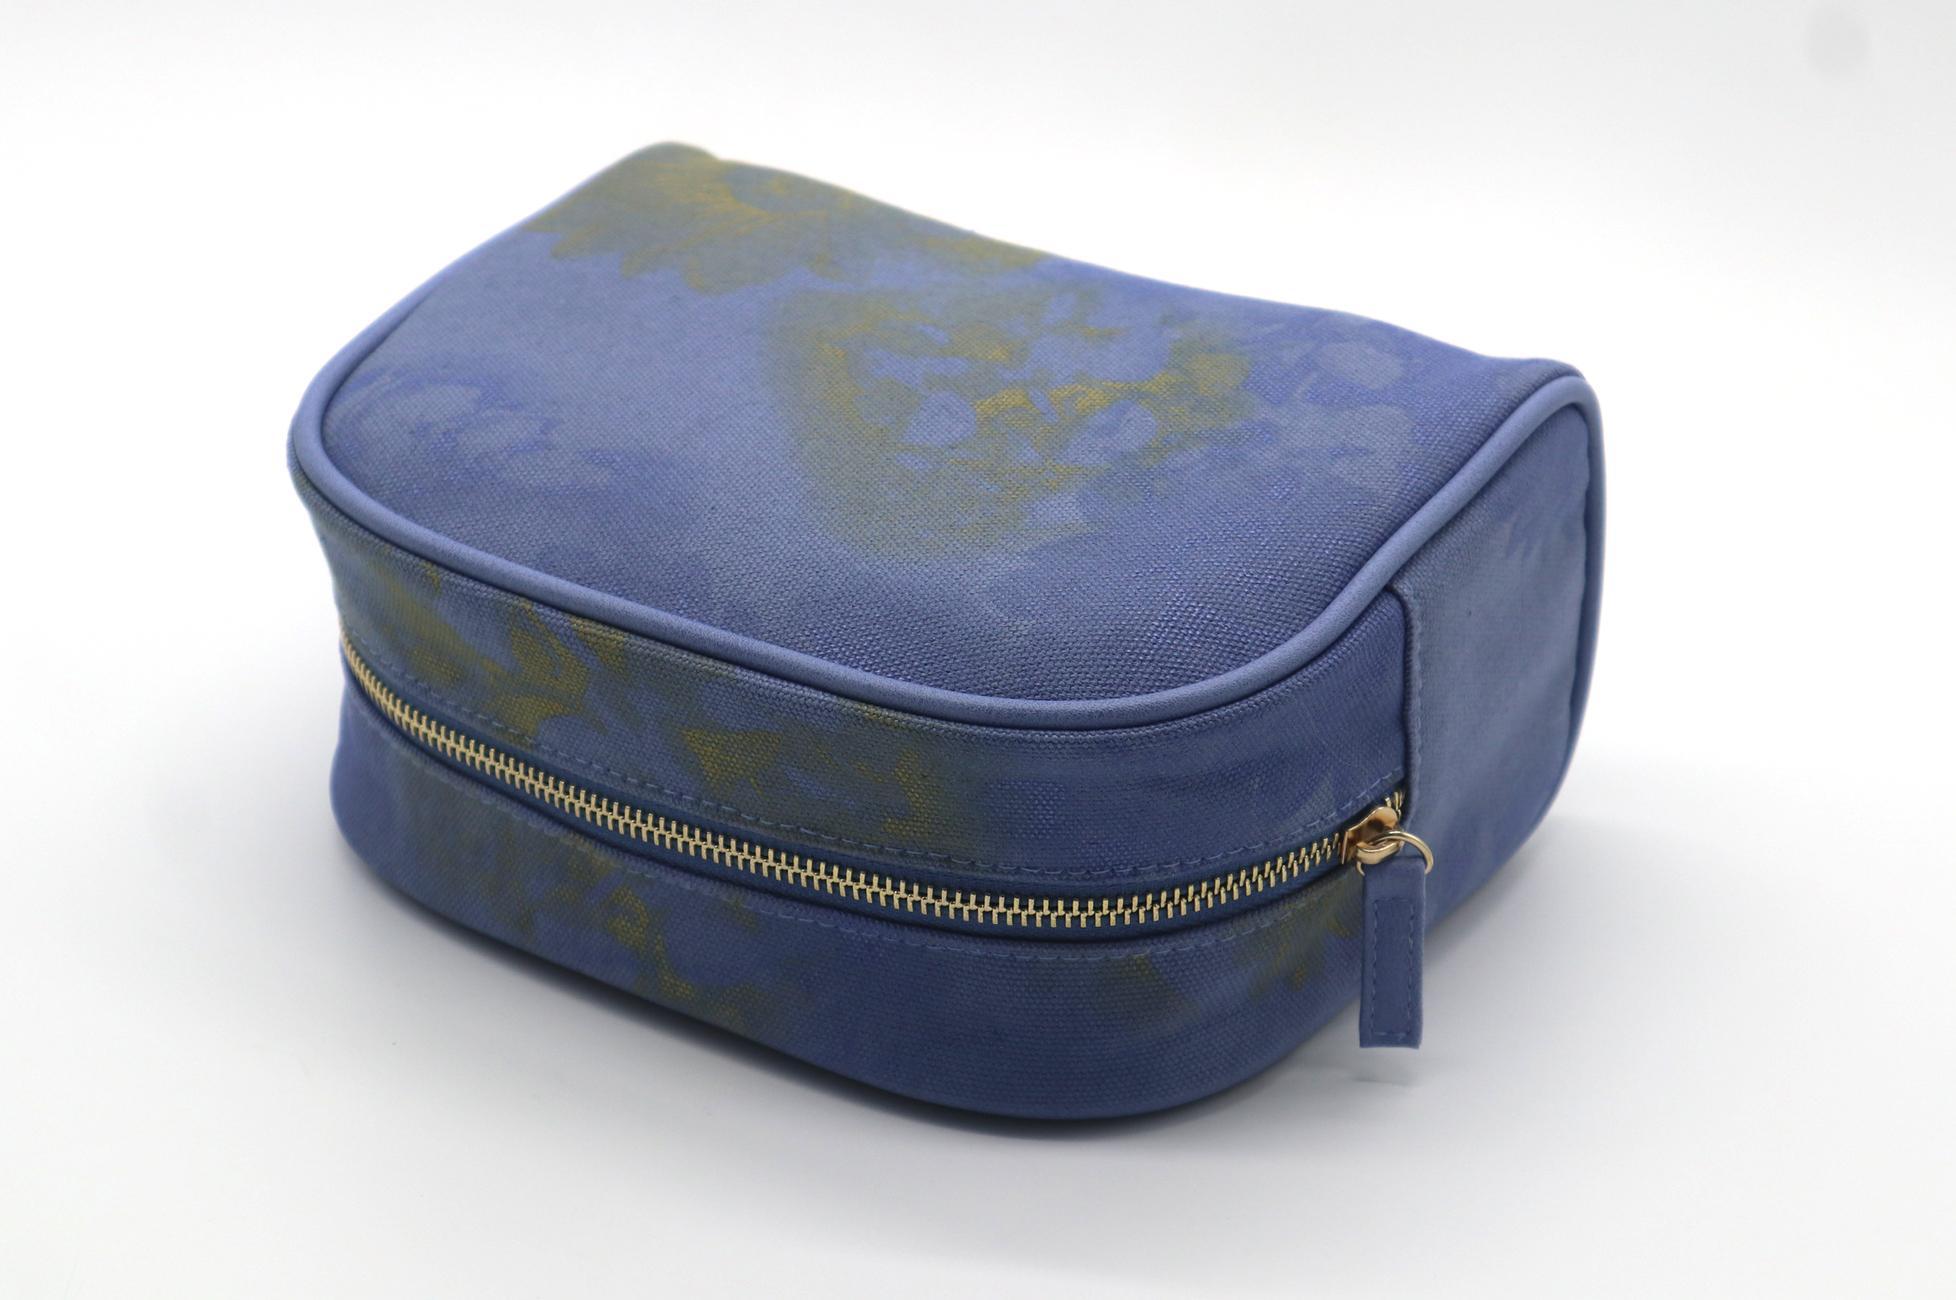 16oz canvas beauty women daisy cosmetic bag sky blue color 5